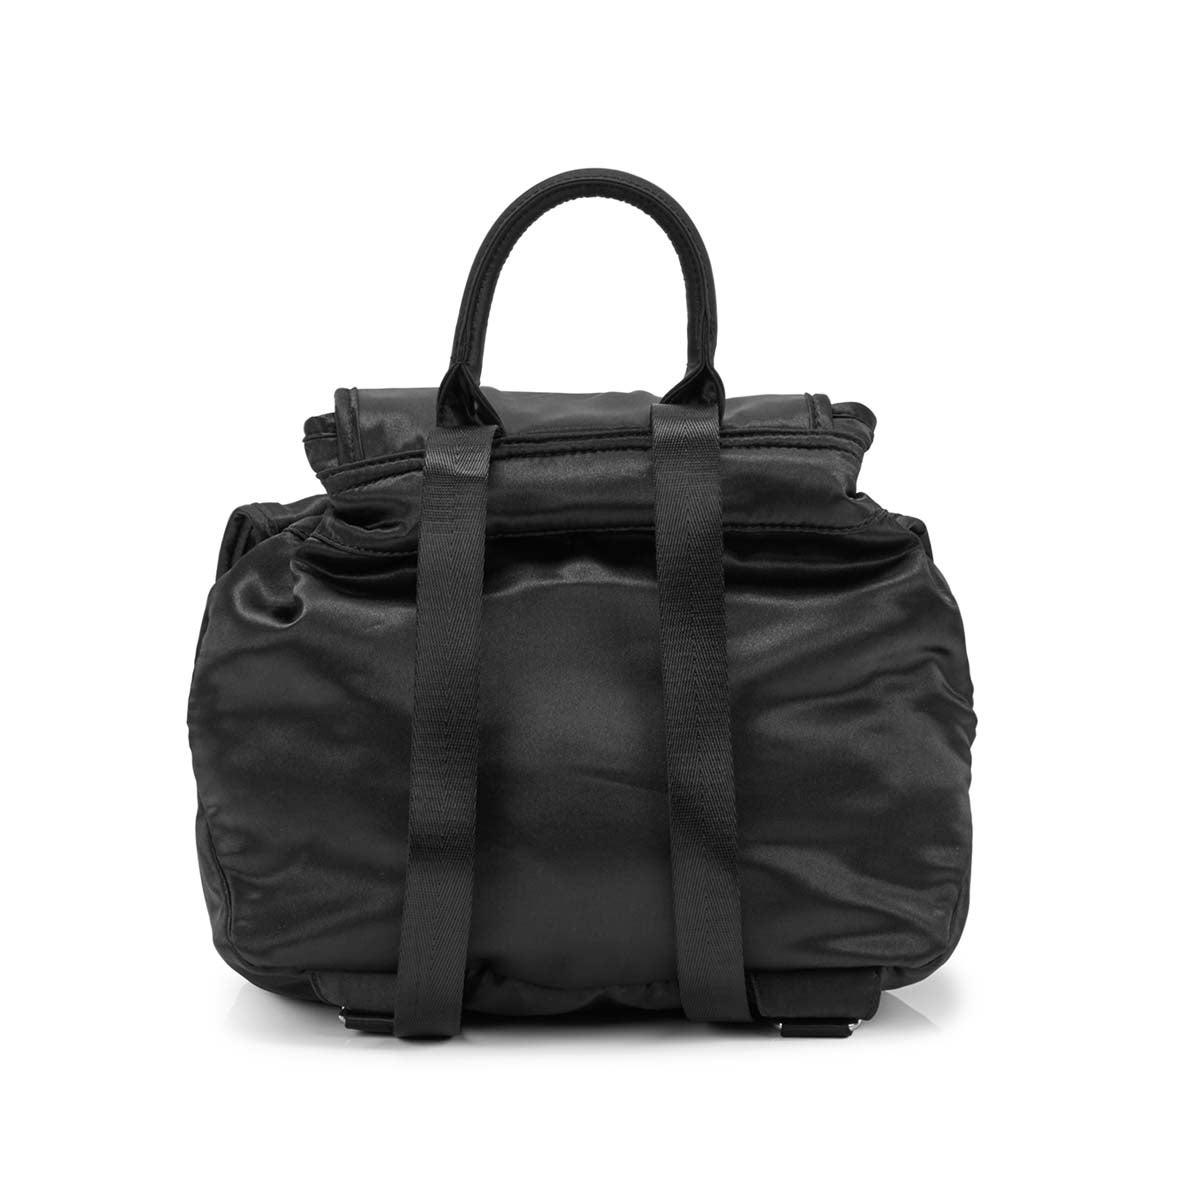 Lds BJax black backpack